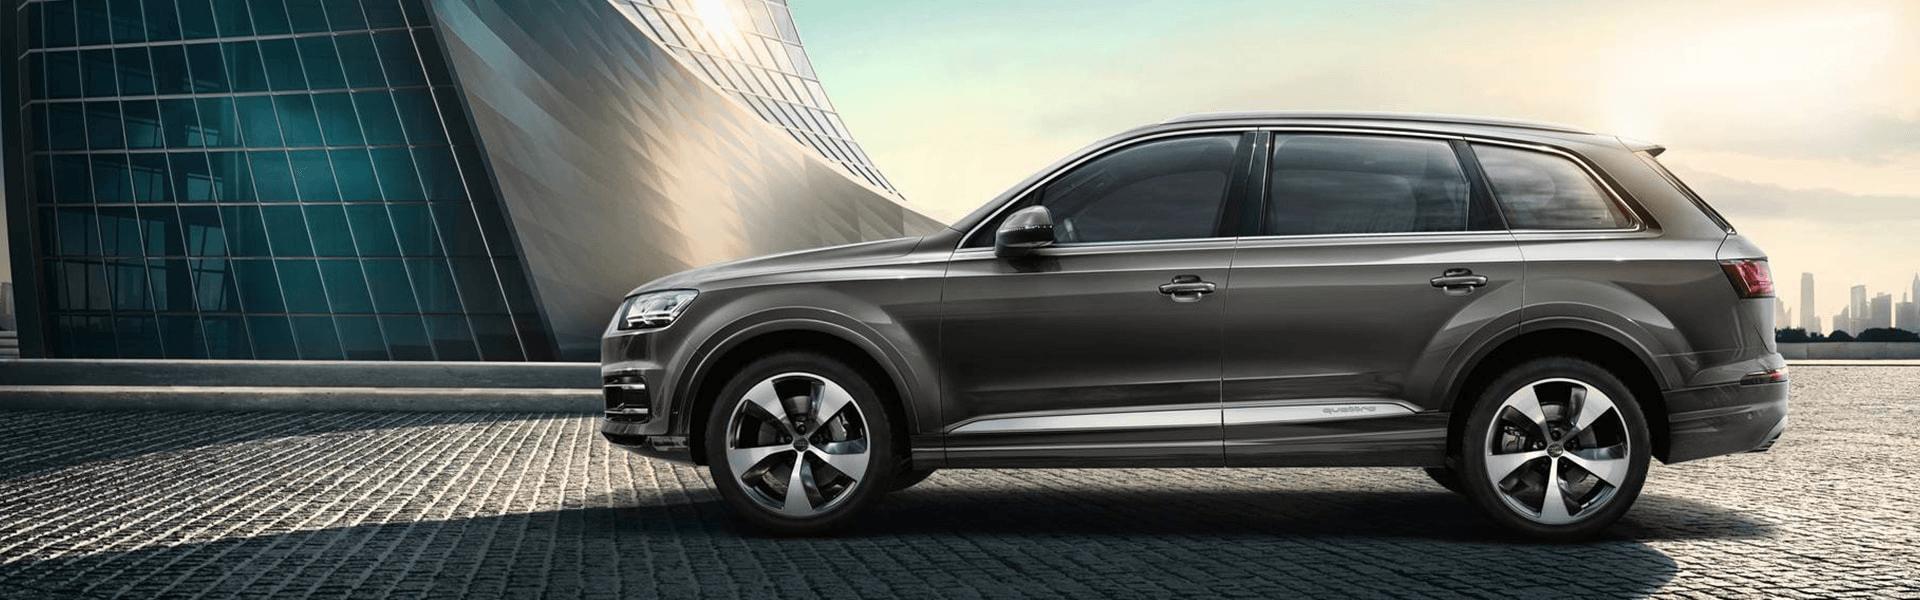 Audi Car Problems